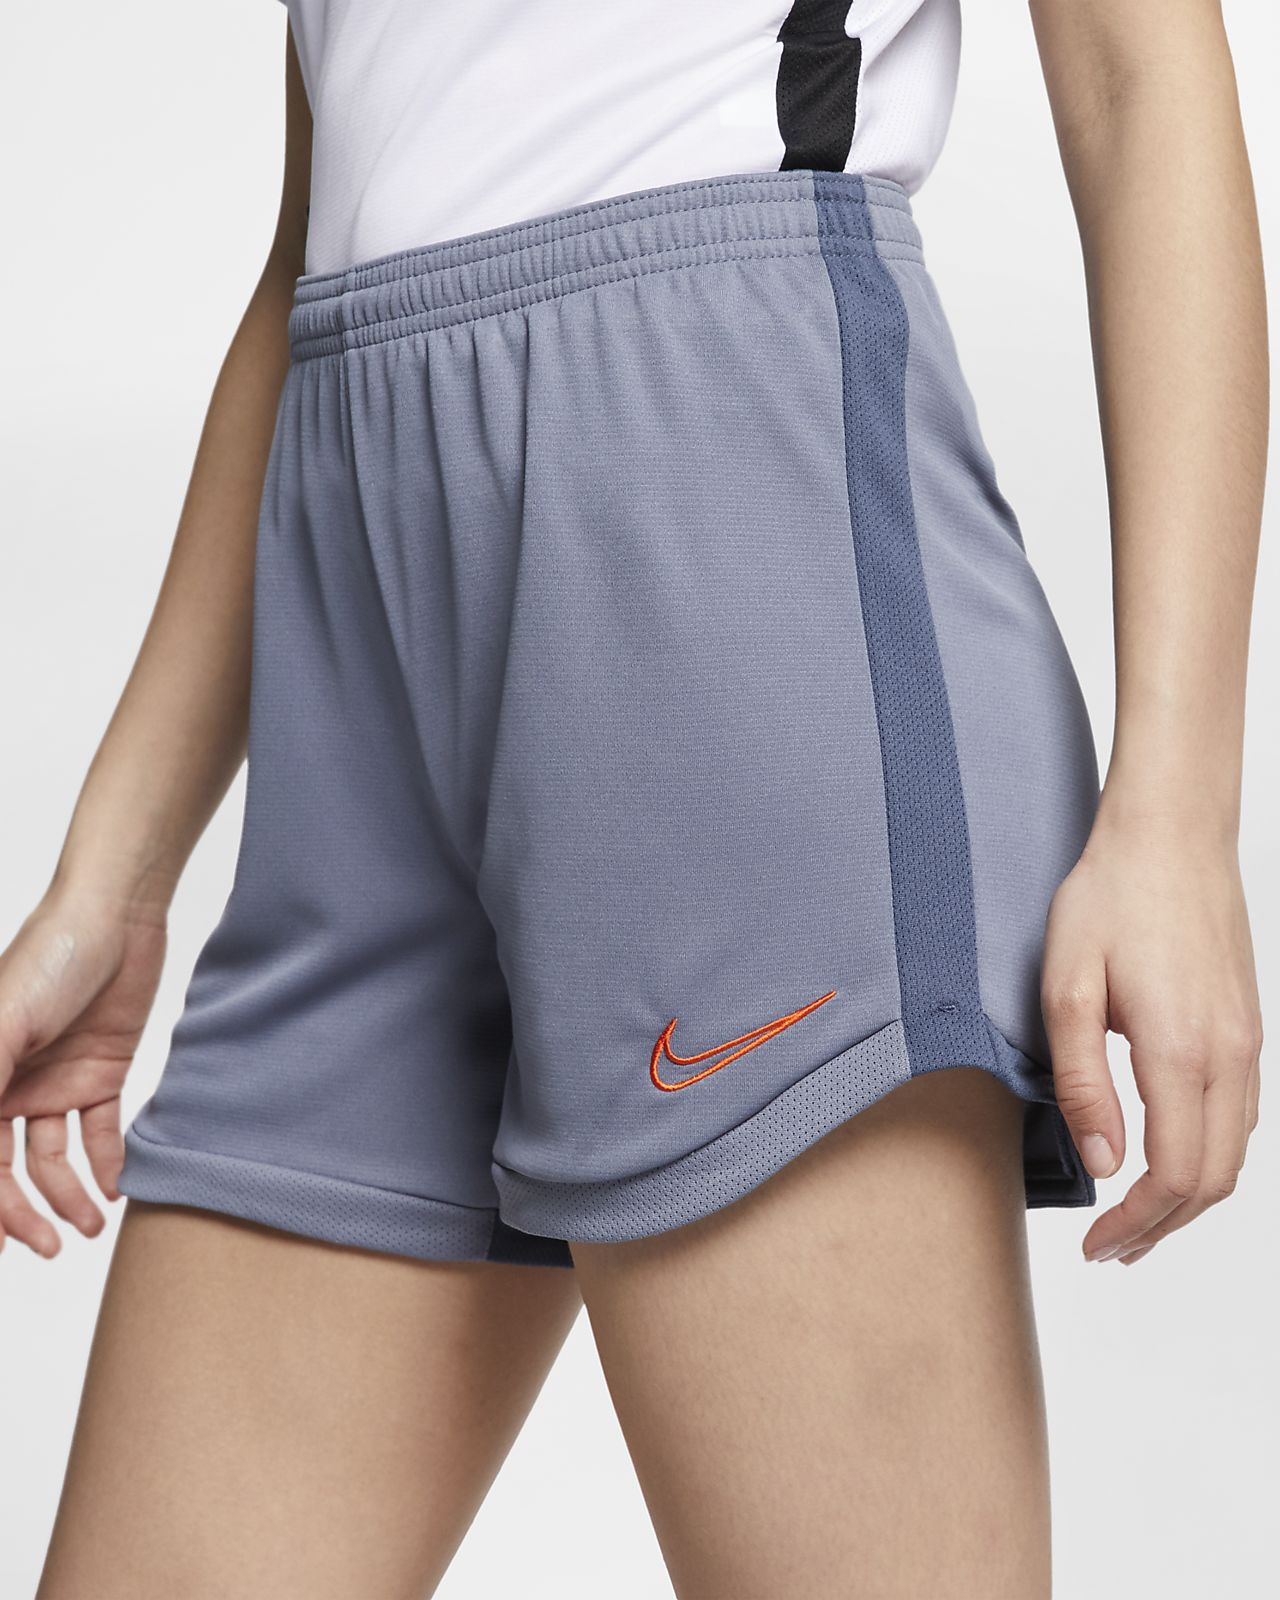 99391cf26f4d Nike Dri-FIT Academy Women s Soccer Shorts. Nike.com